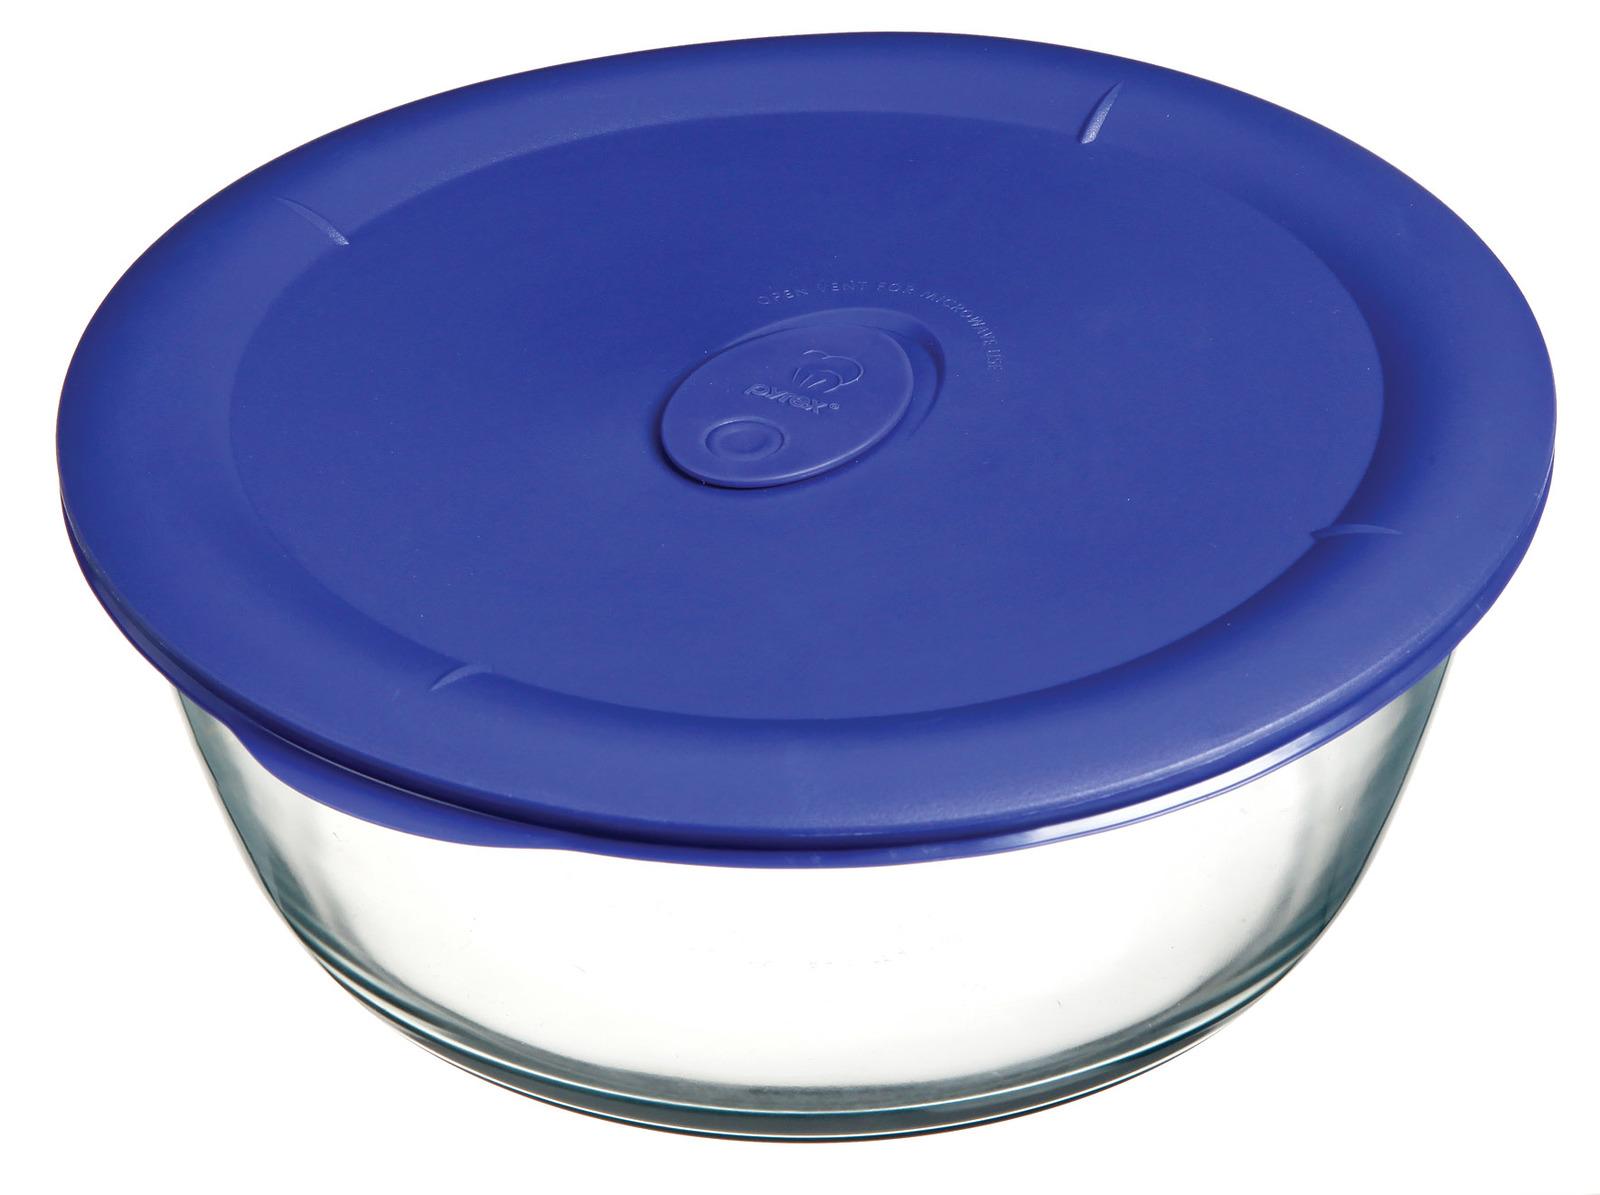 Pyrex: Pro Round Storage Dish - Blue (2.85L) image